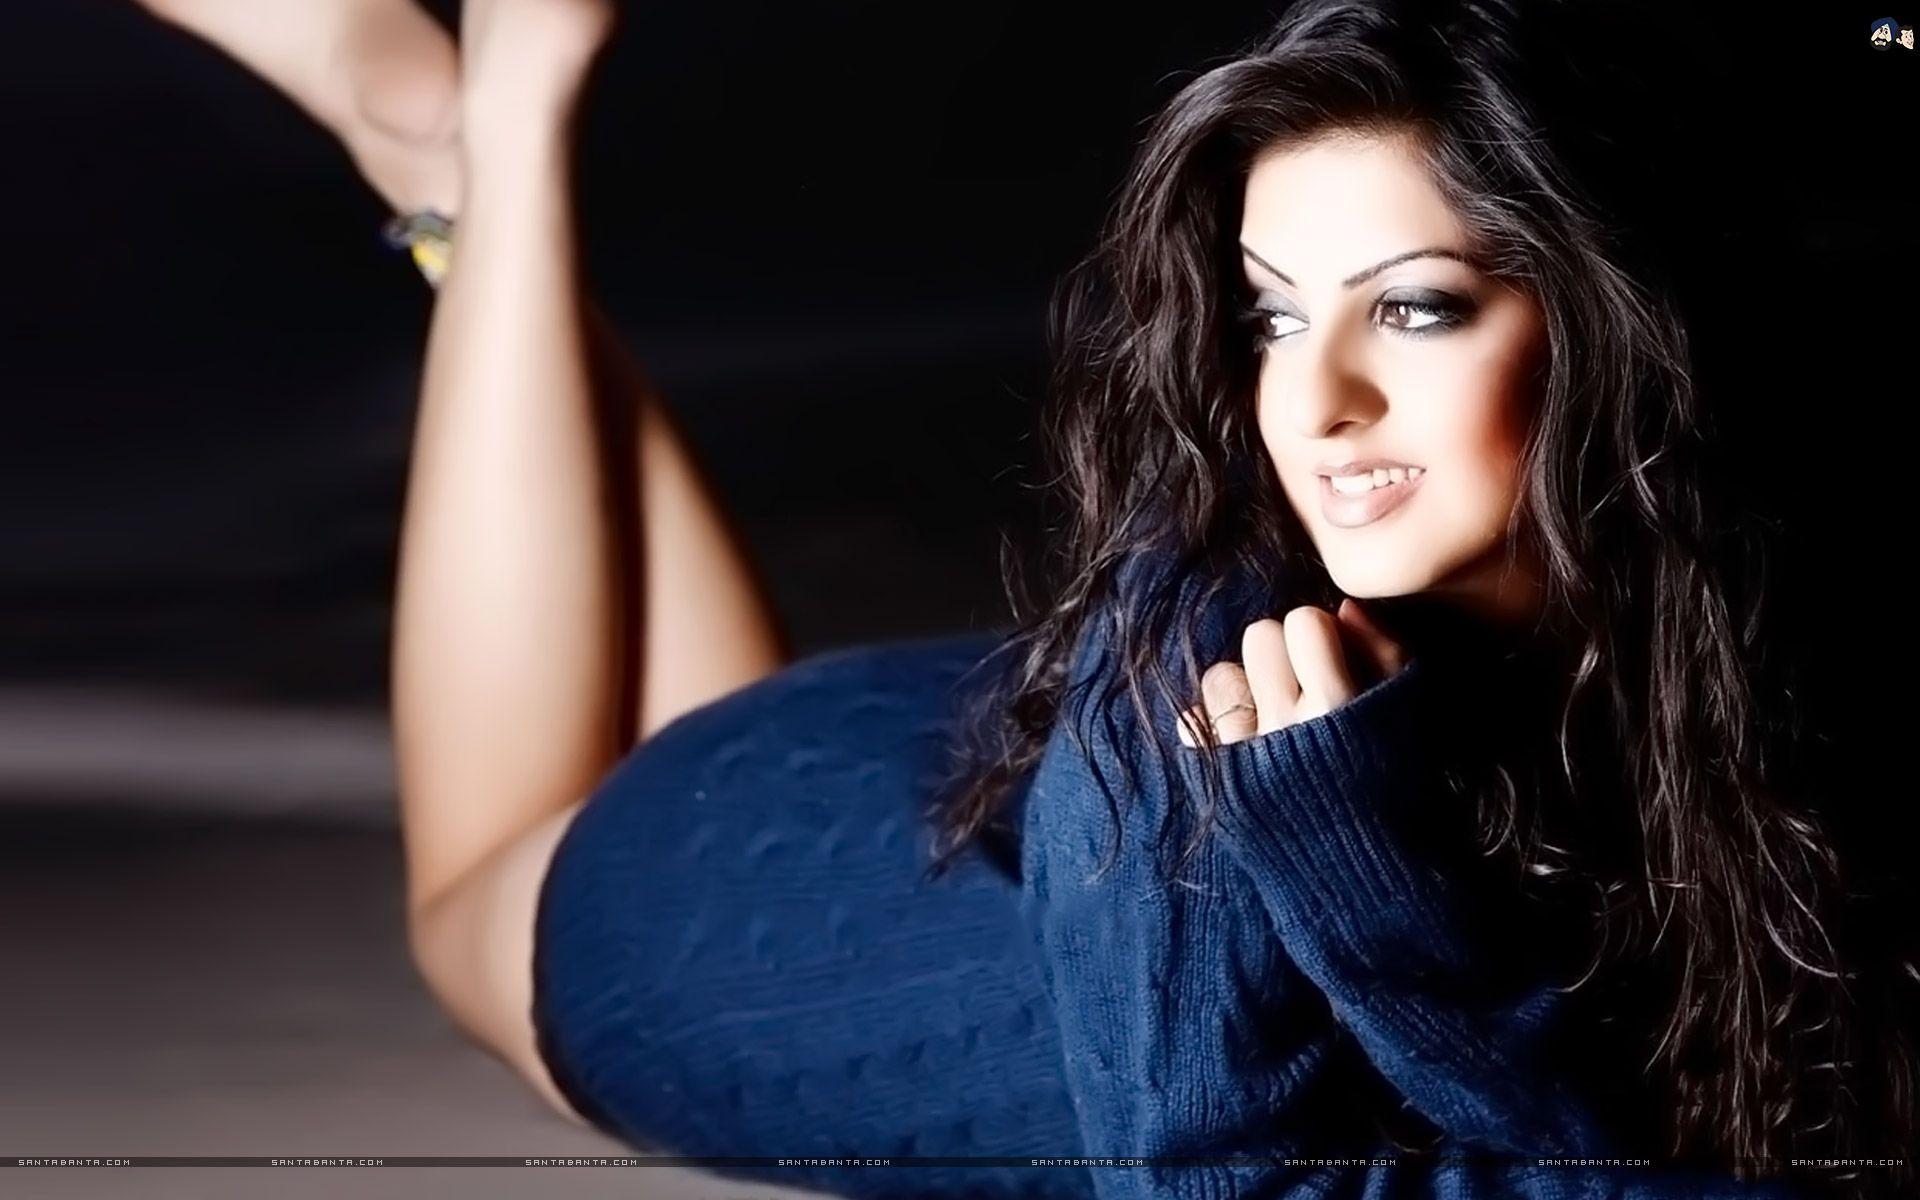 Pin By Gaurav Parmar On Indian Celebrities Hottest Pic Indian Celebrities Beauty Amrita prakash nice pics hd wallpaper